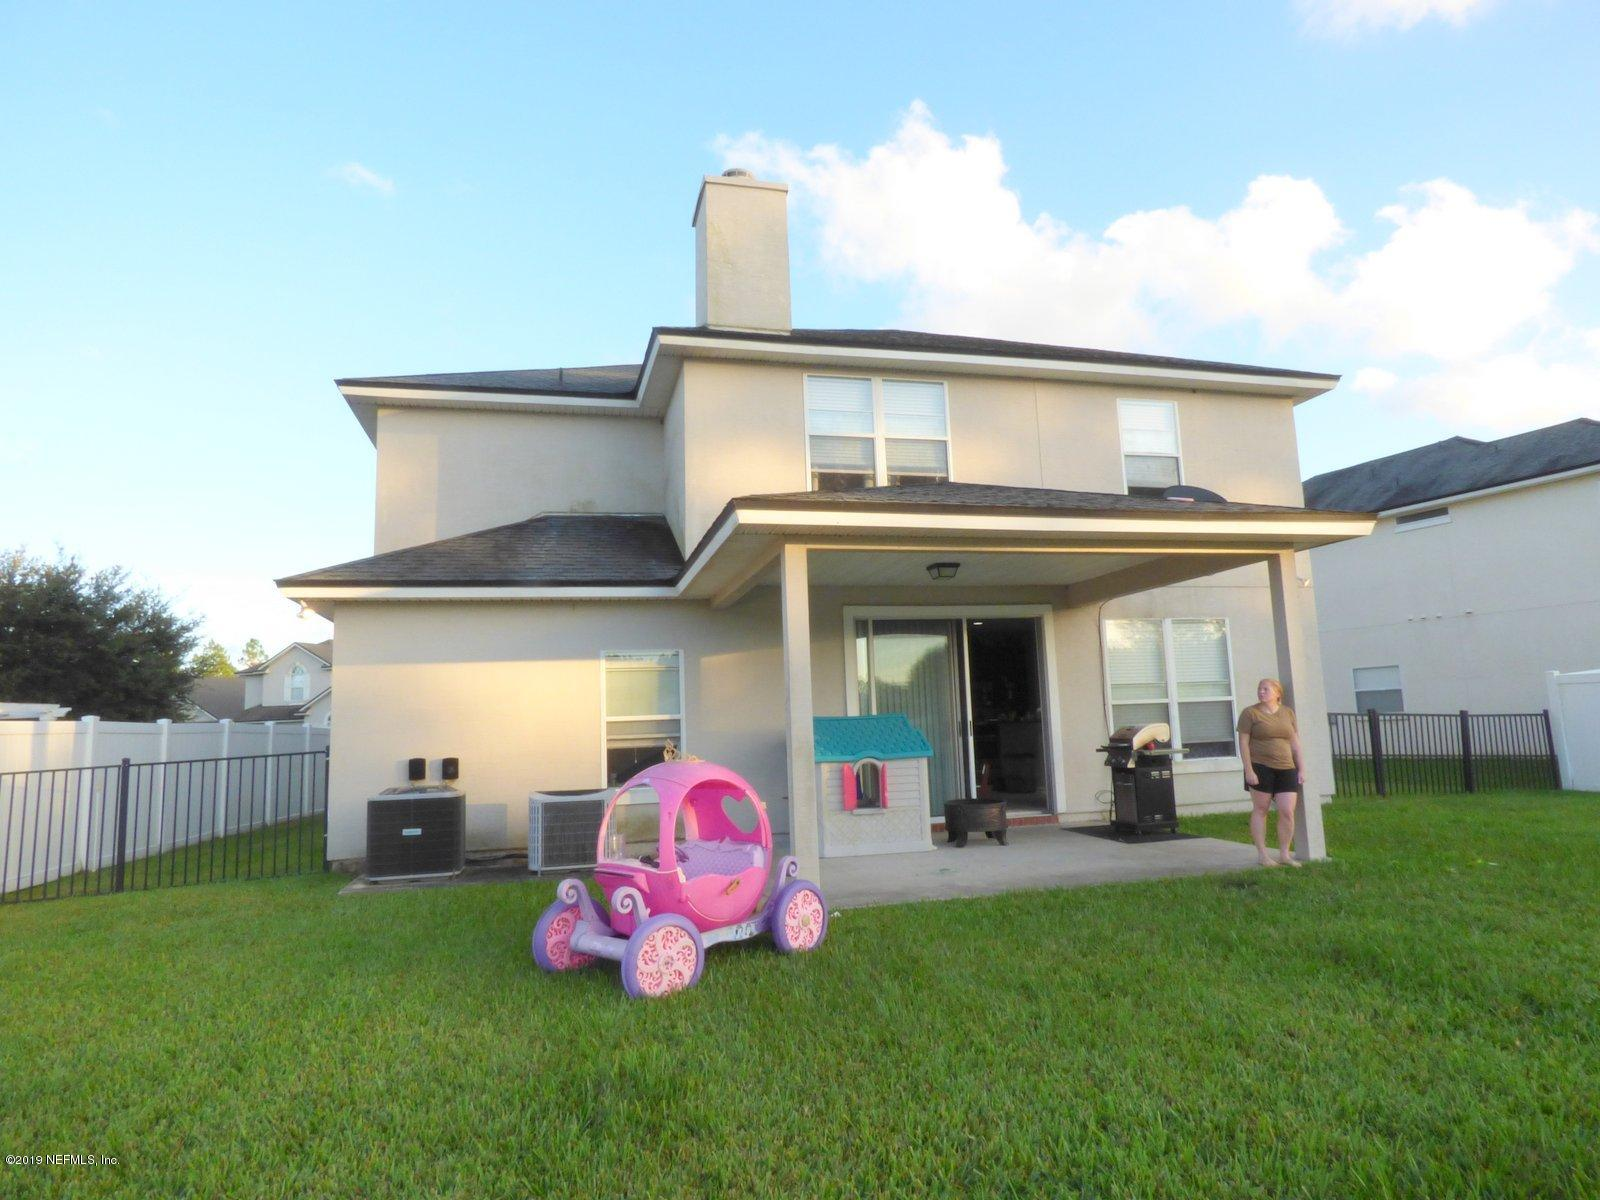 826 MOSSWOOD CHASE, ORANGE PARK, FLORIDA 32065, 4 Bedrooms Bedrooms, ,3 BathroomsBathrooms,Rental,For sale,MOSSWOOD CHASE,1025690